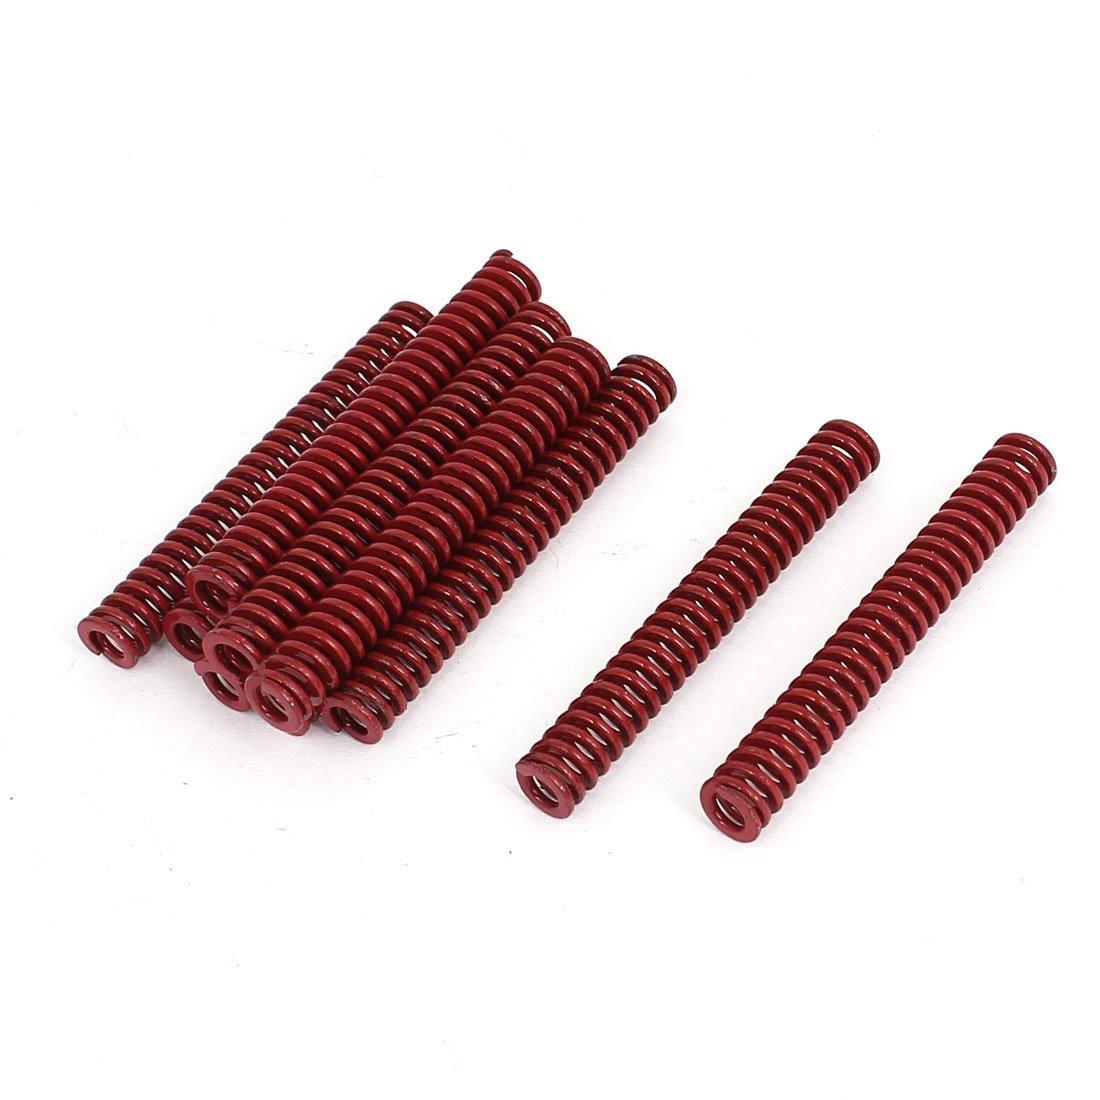 8mm OD 60mm Long Medium Load Compression Mould Die Spring Red 10pcs DealMux DLM-B013U2WCEQ